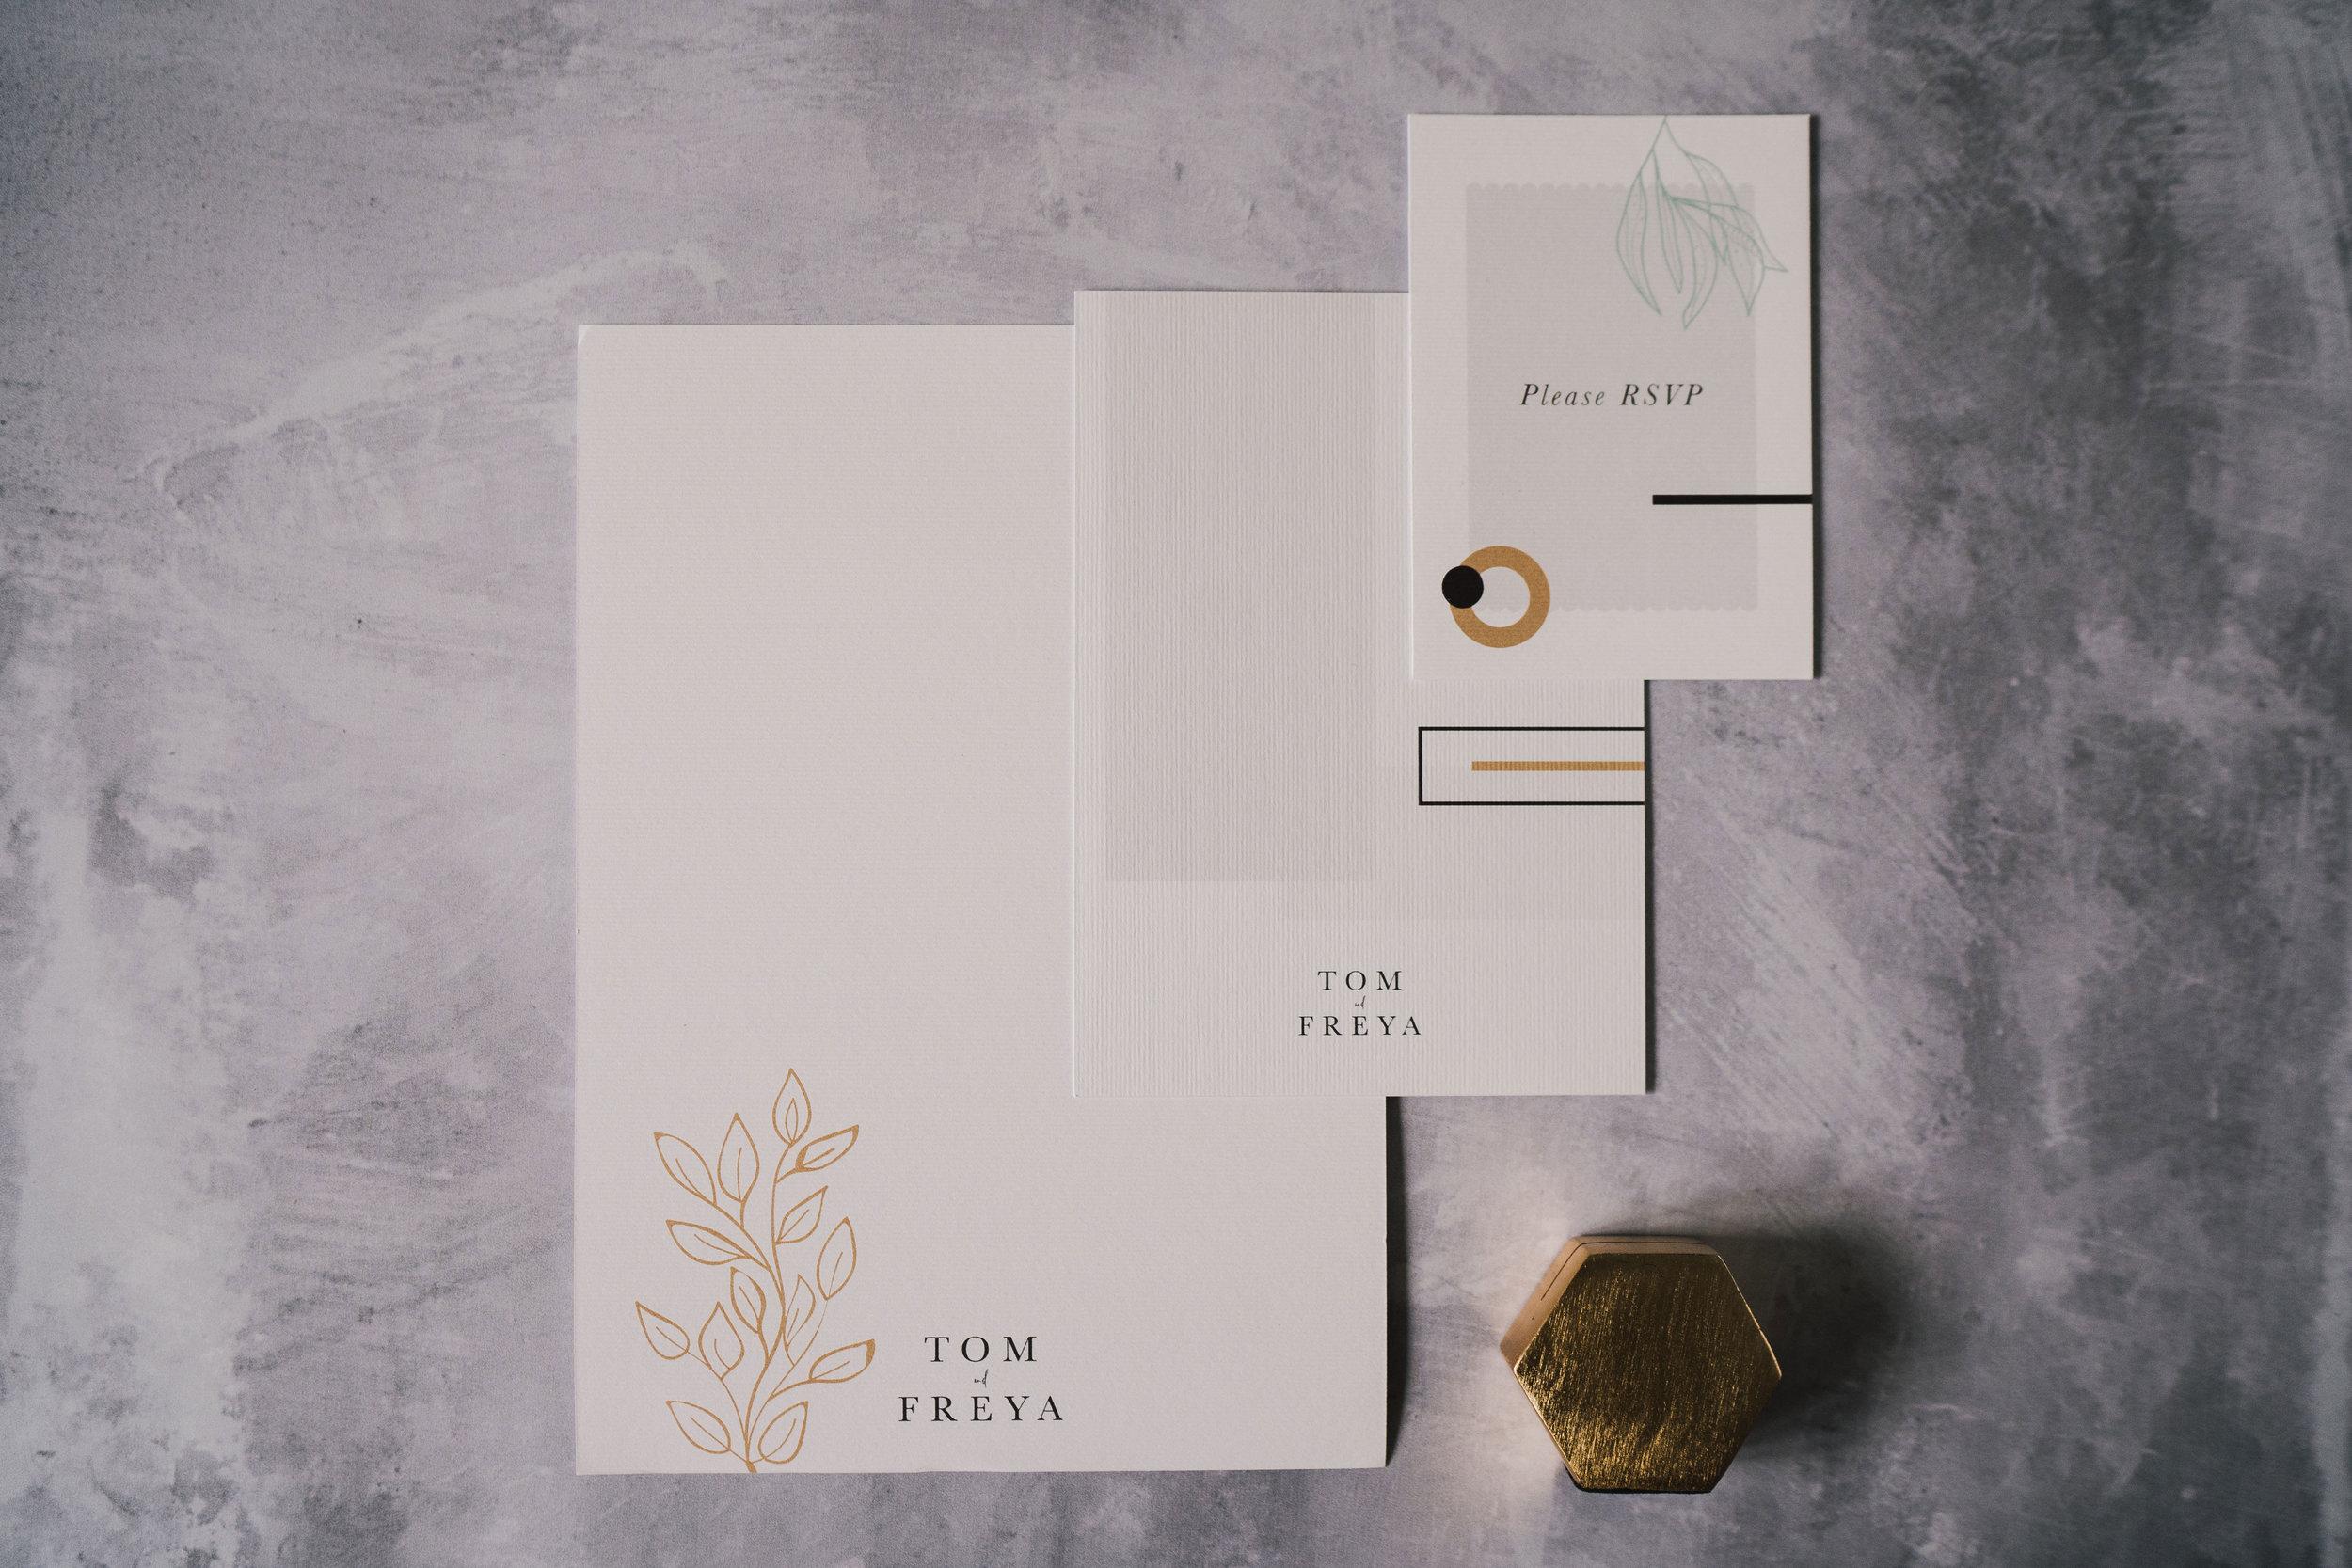 Freya_Wedding_Invitation_Template_3.jpg